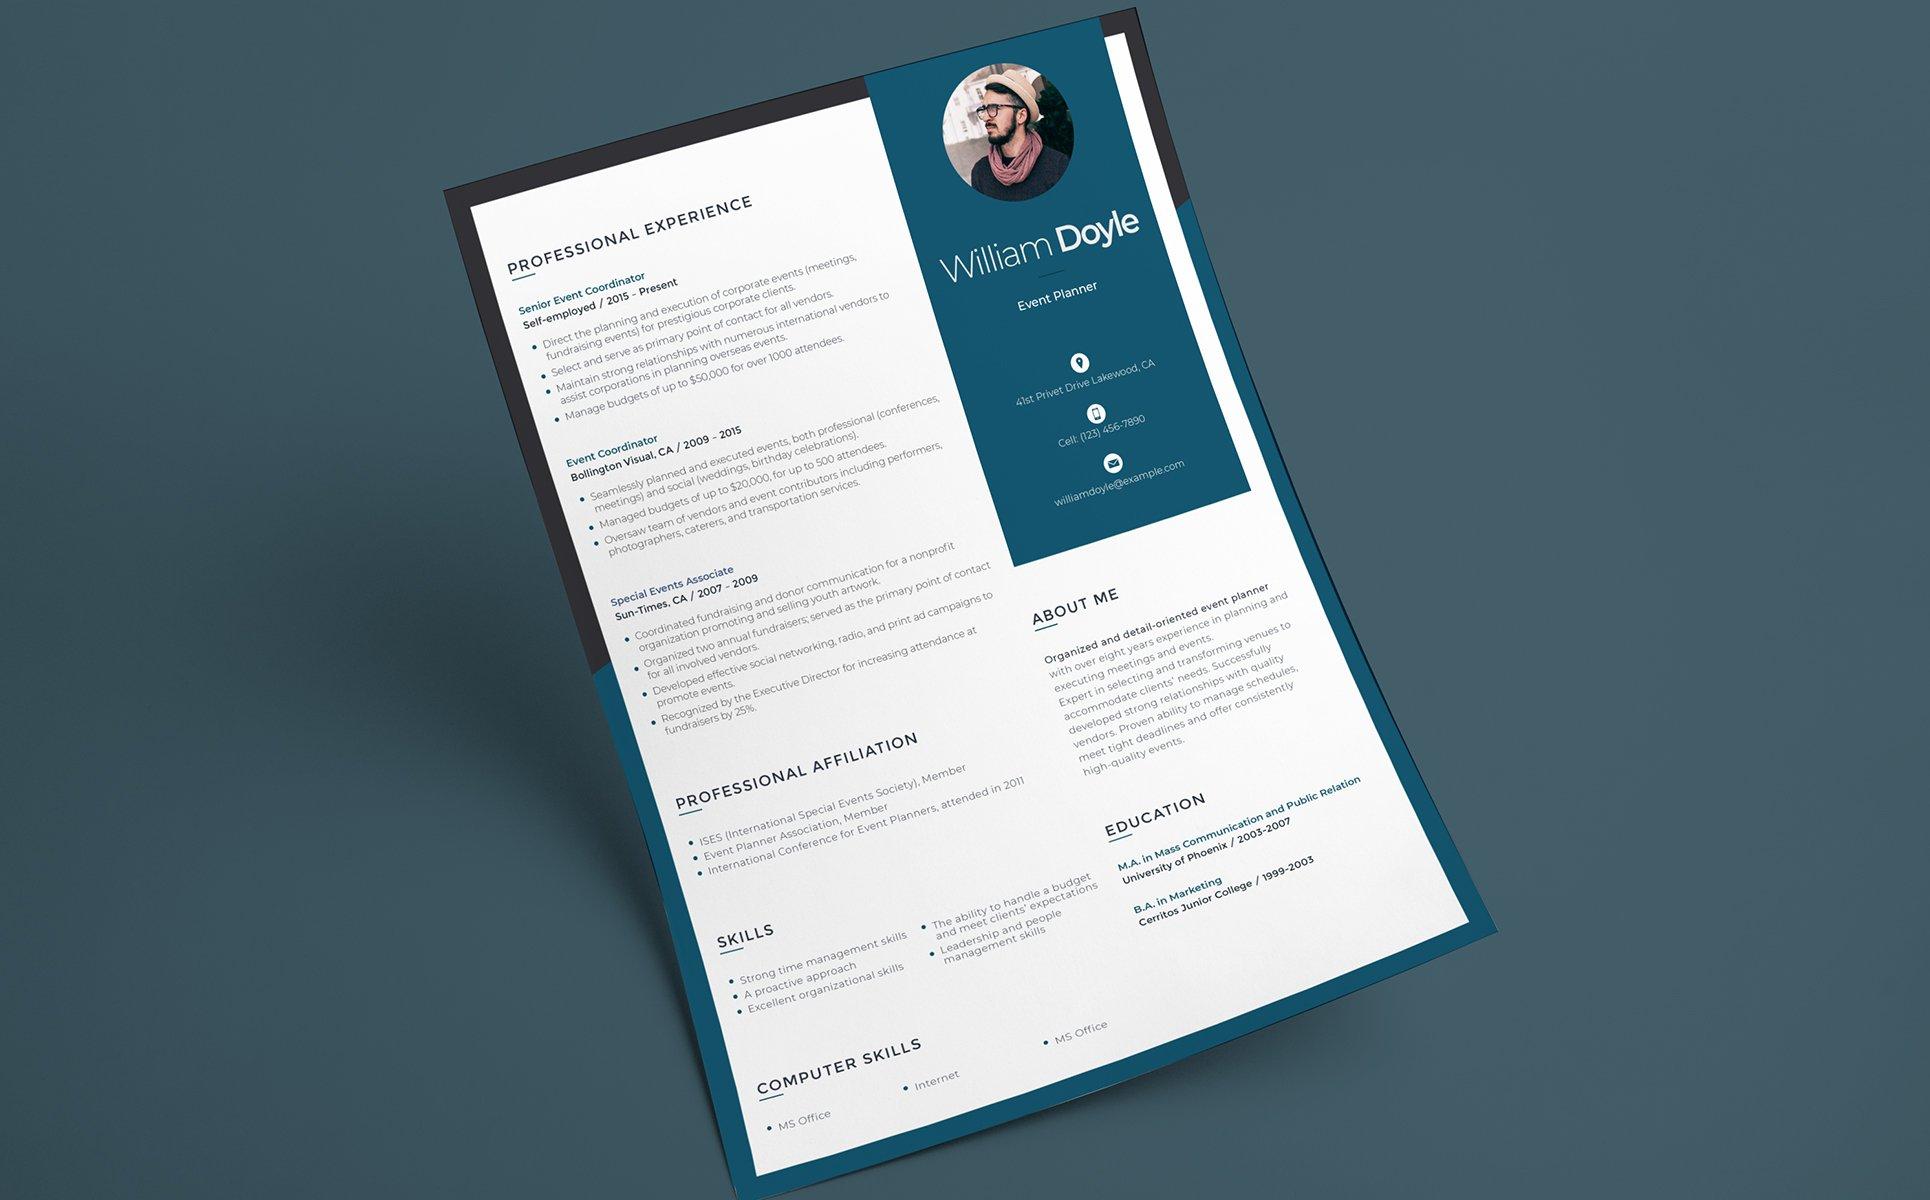 Wiliam Doyle - Event Manager Resume Template #65252